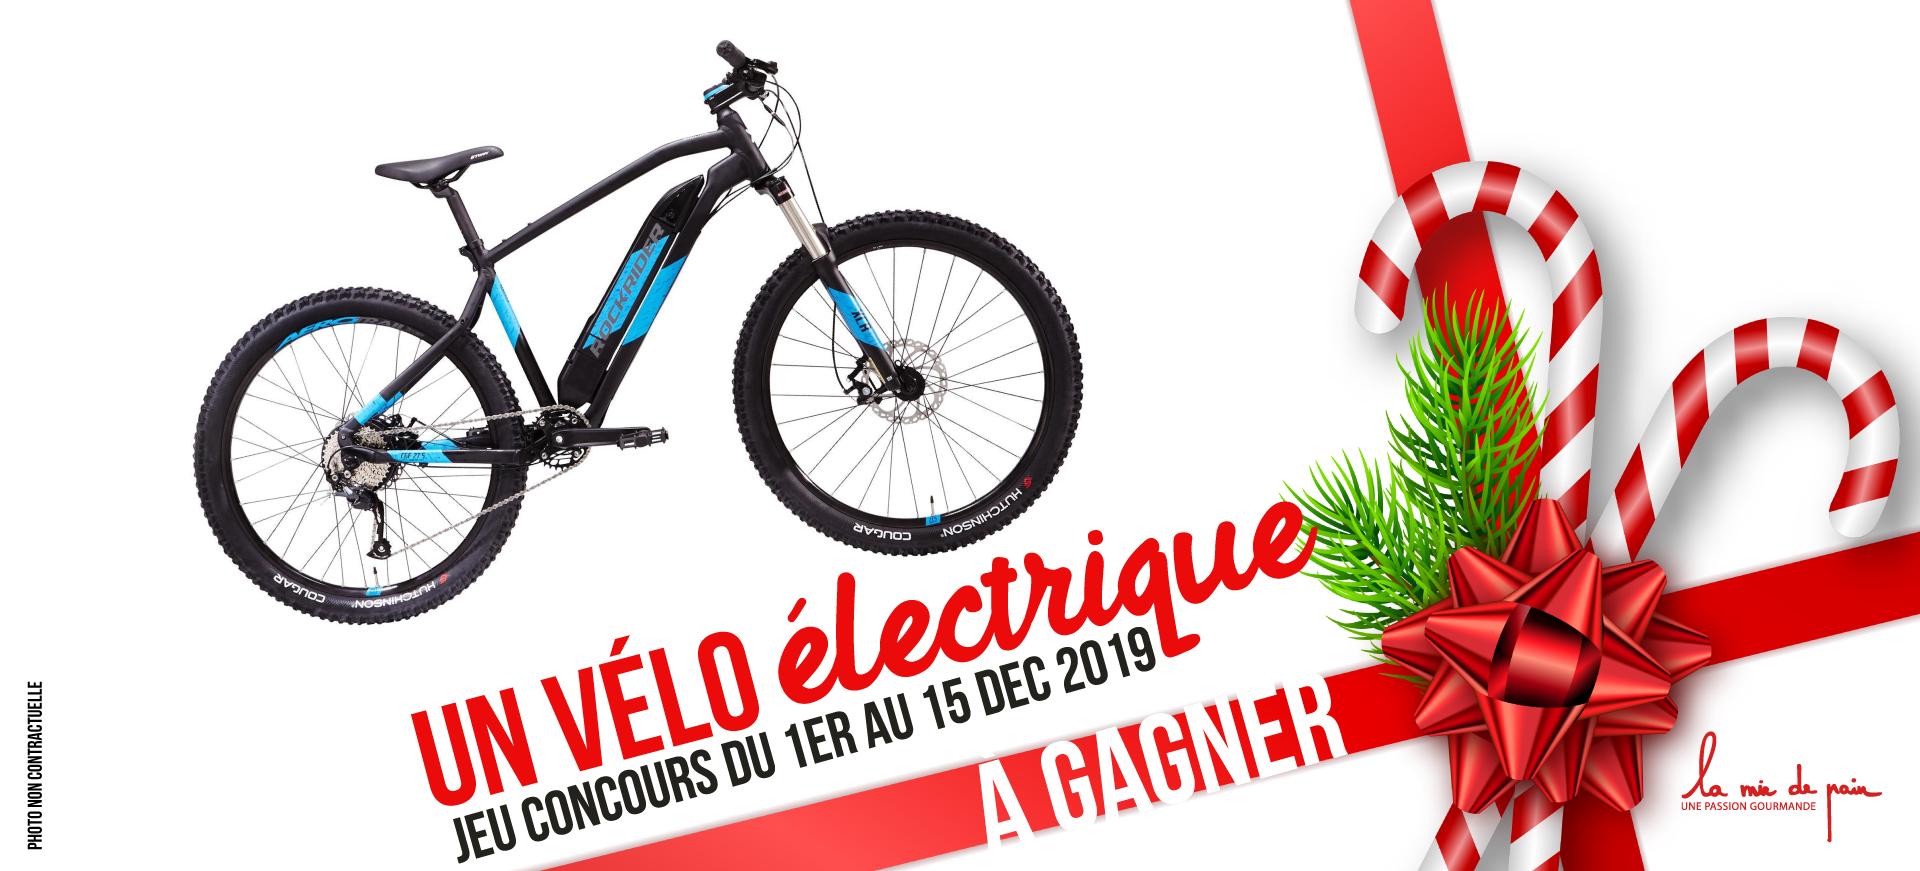 NOEL-V2-2019-VELO-ELECTRIQUE-lamiedepain-boulangerie-2019-1920x871px